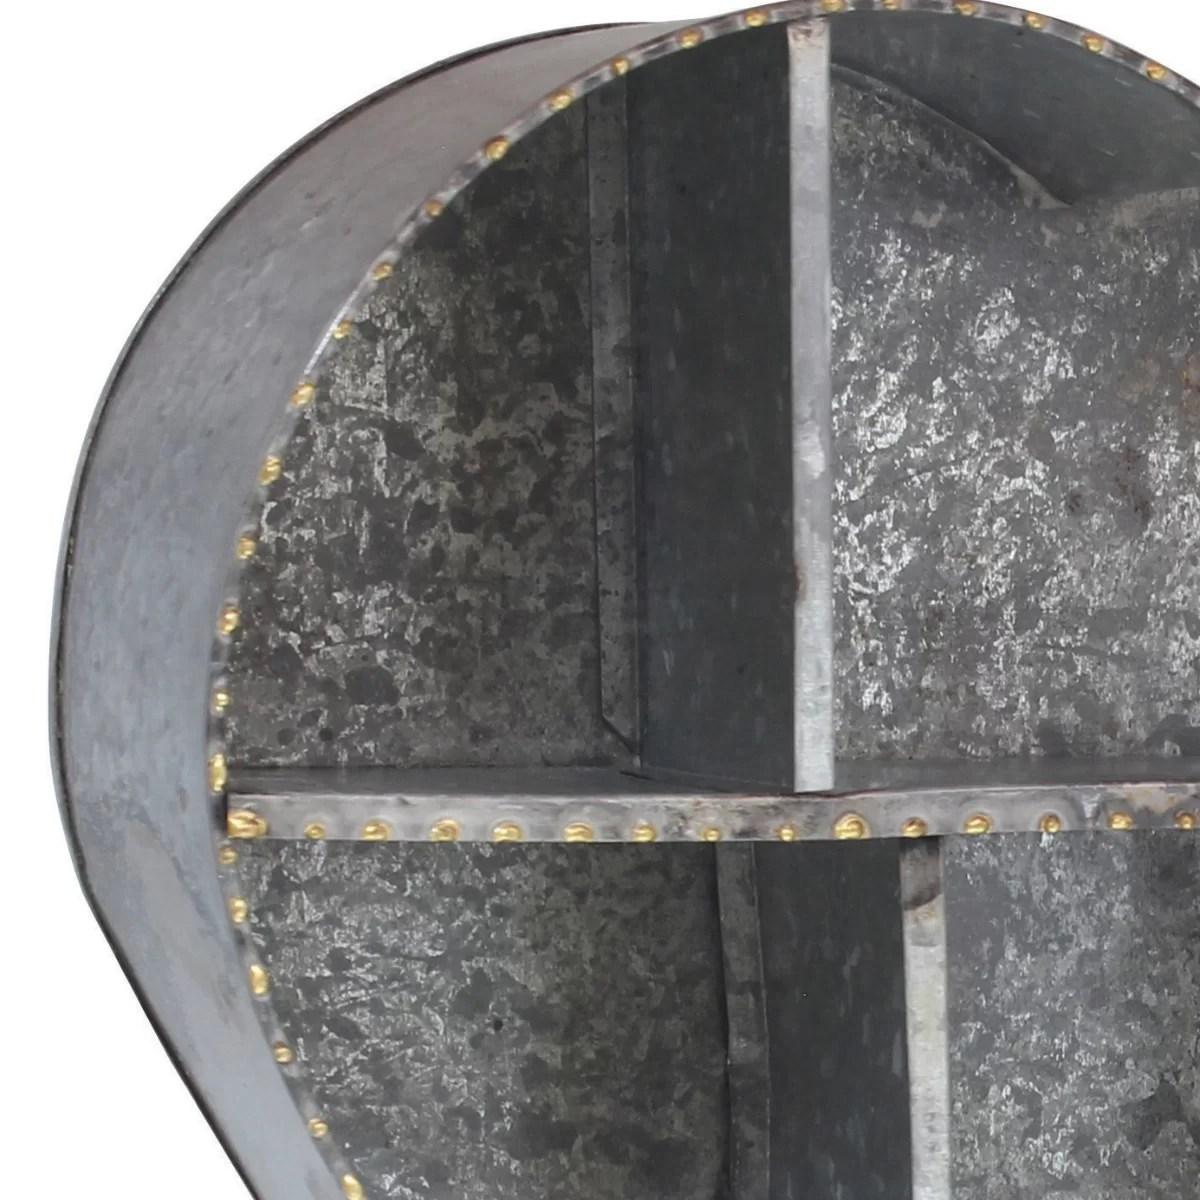 Ckk Home Decor Lp Stonebriar Heart Galvanized Metal Wall